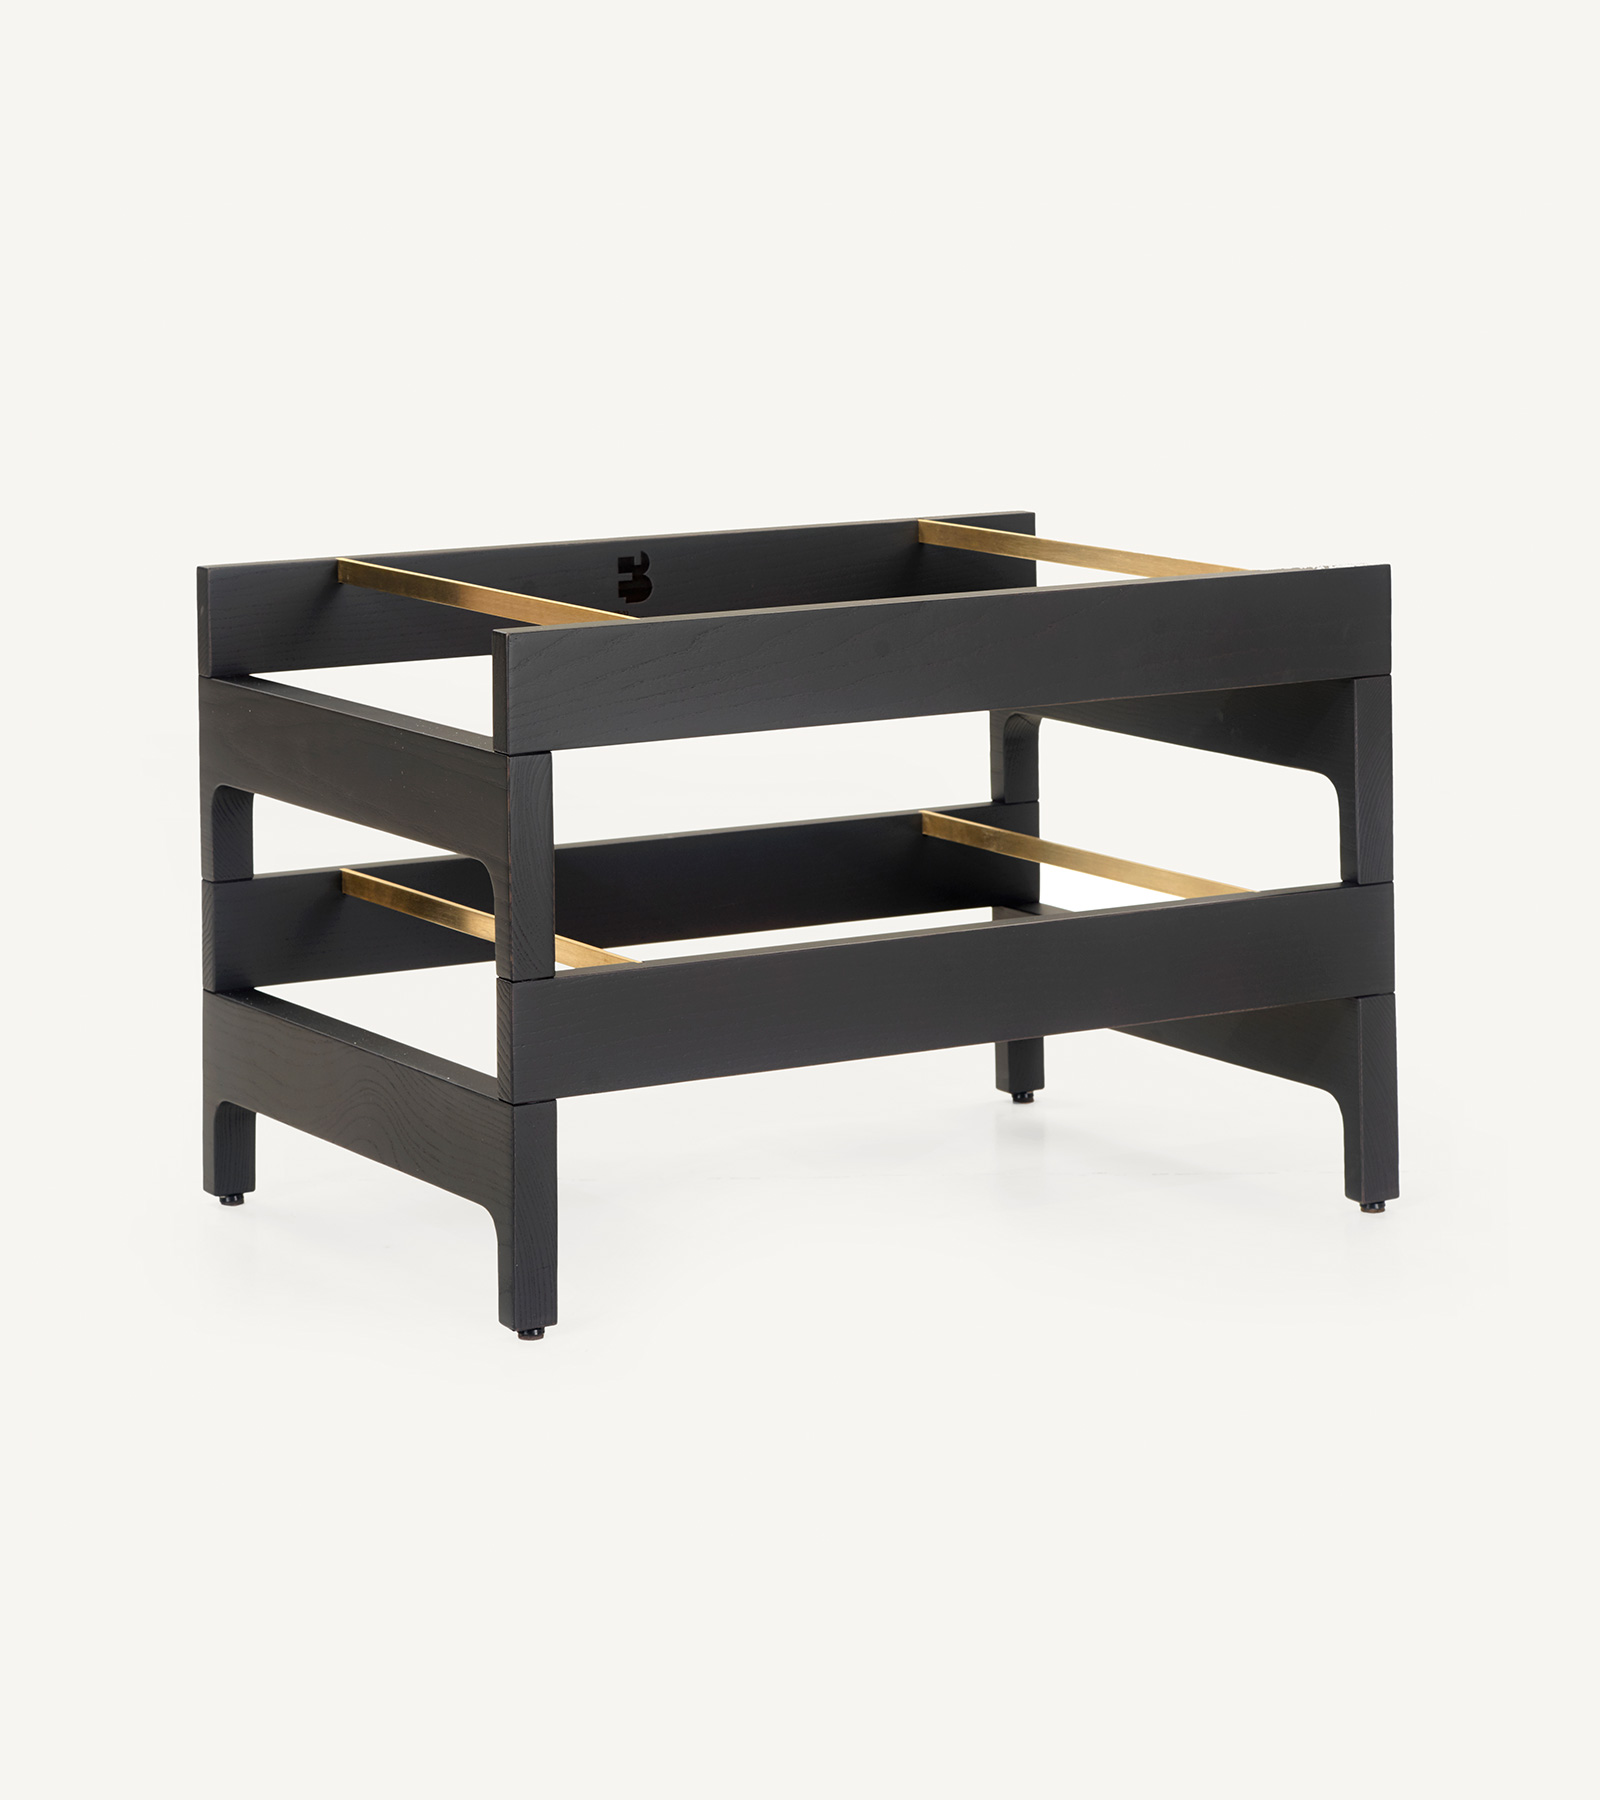 TinnappleMetz-bassamfellows-Tray-Rack-Side-Table-05